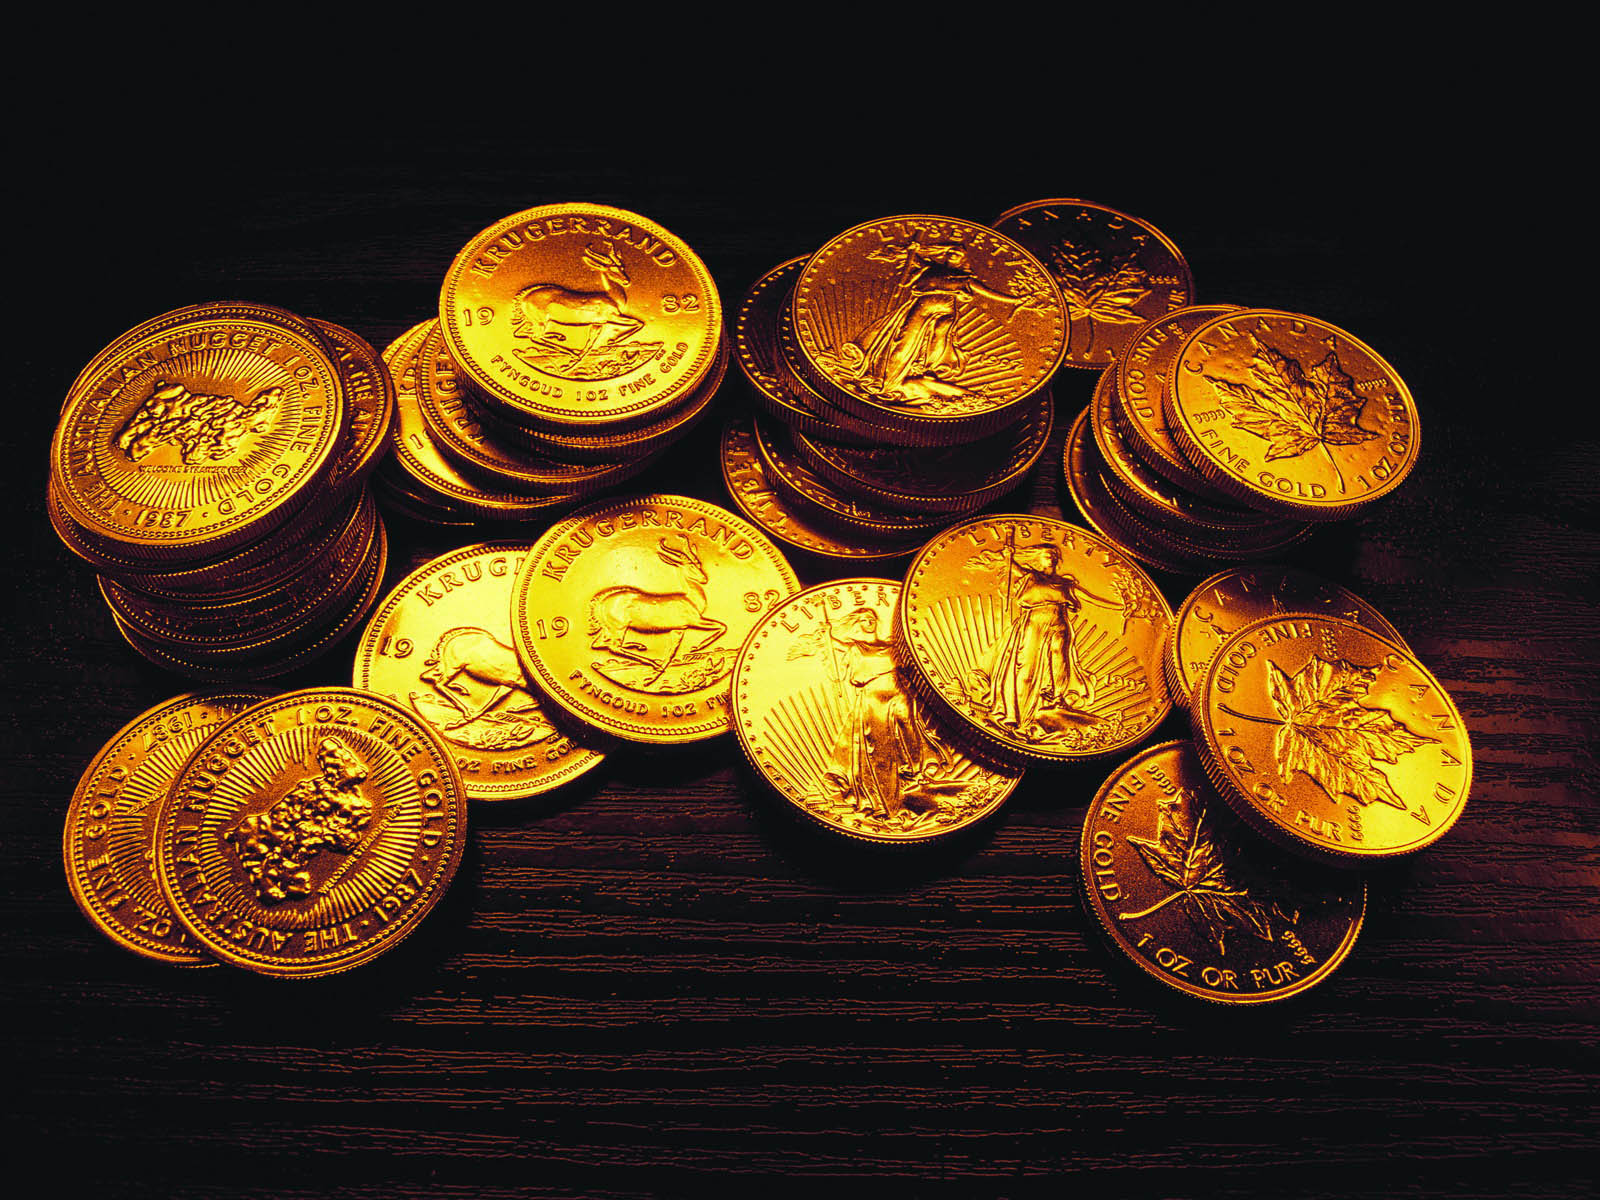 Картинка money (36) - Картинки Деньги - Бесплатные ...: http://pictar.ru/img-money-36-27885.htm